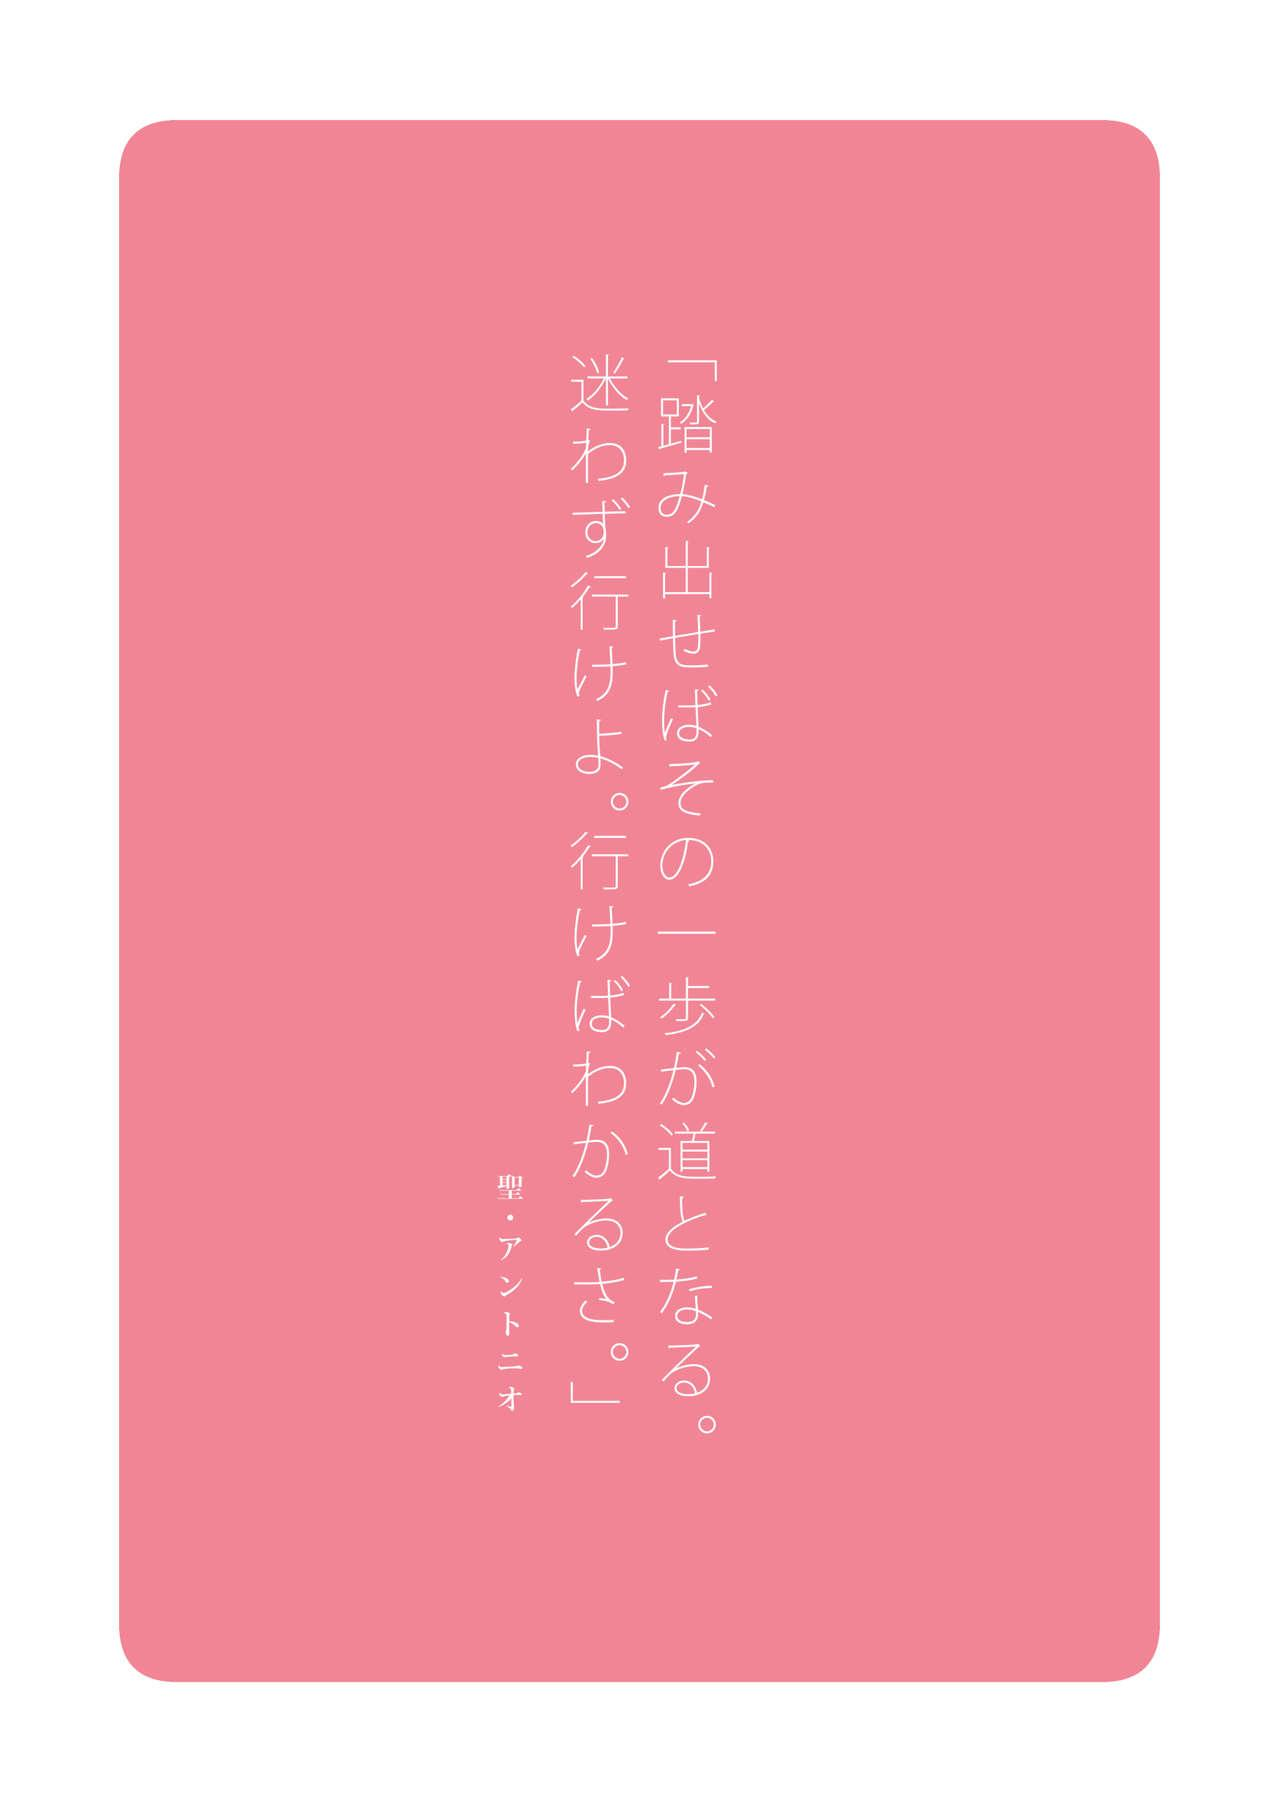 Isogasii Okaasan No Tamuno Sasa Rouzin Seikaigo | Guide for Elderly Sex Health Care to Busy Mom 7